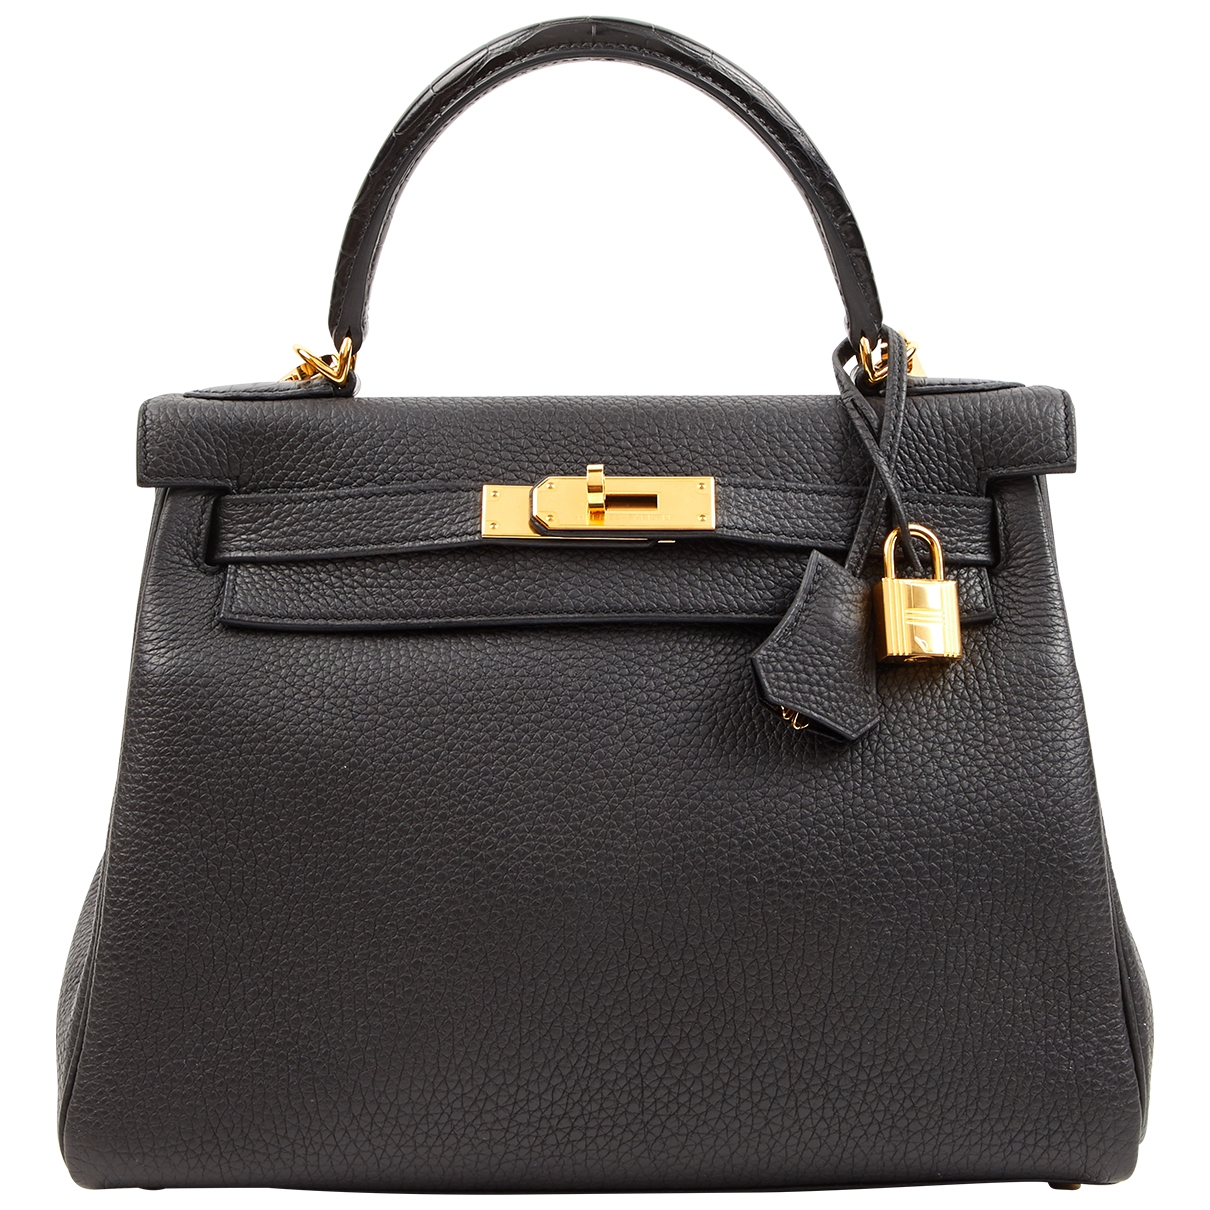 Hermes Kelly 28 Handtasche in  Schwarz Leder